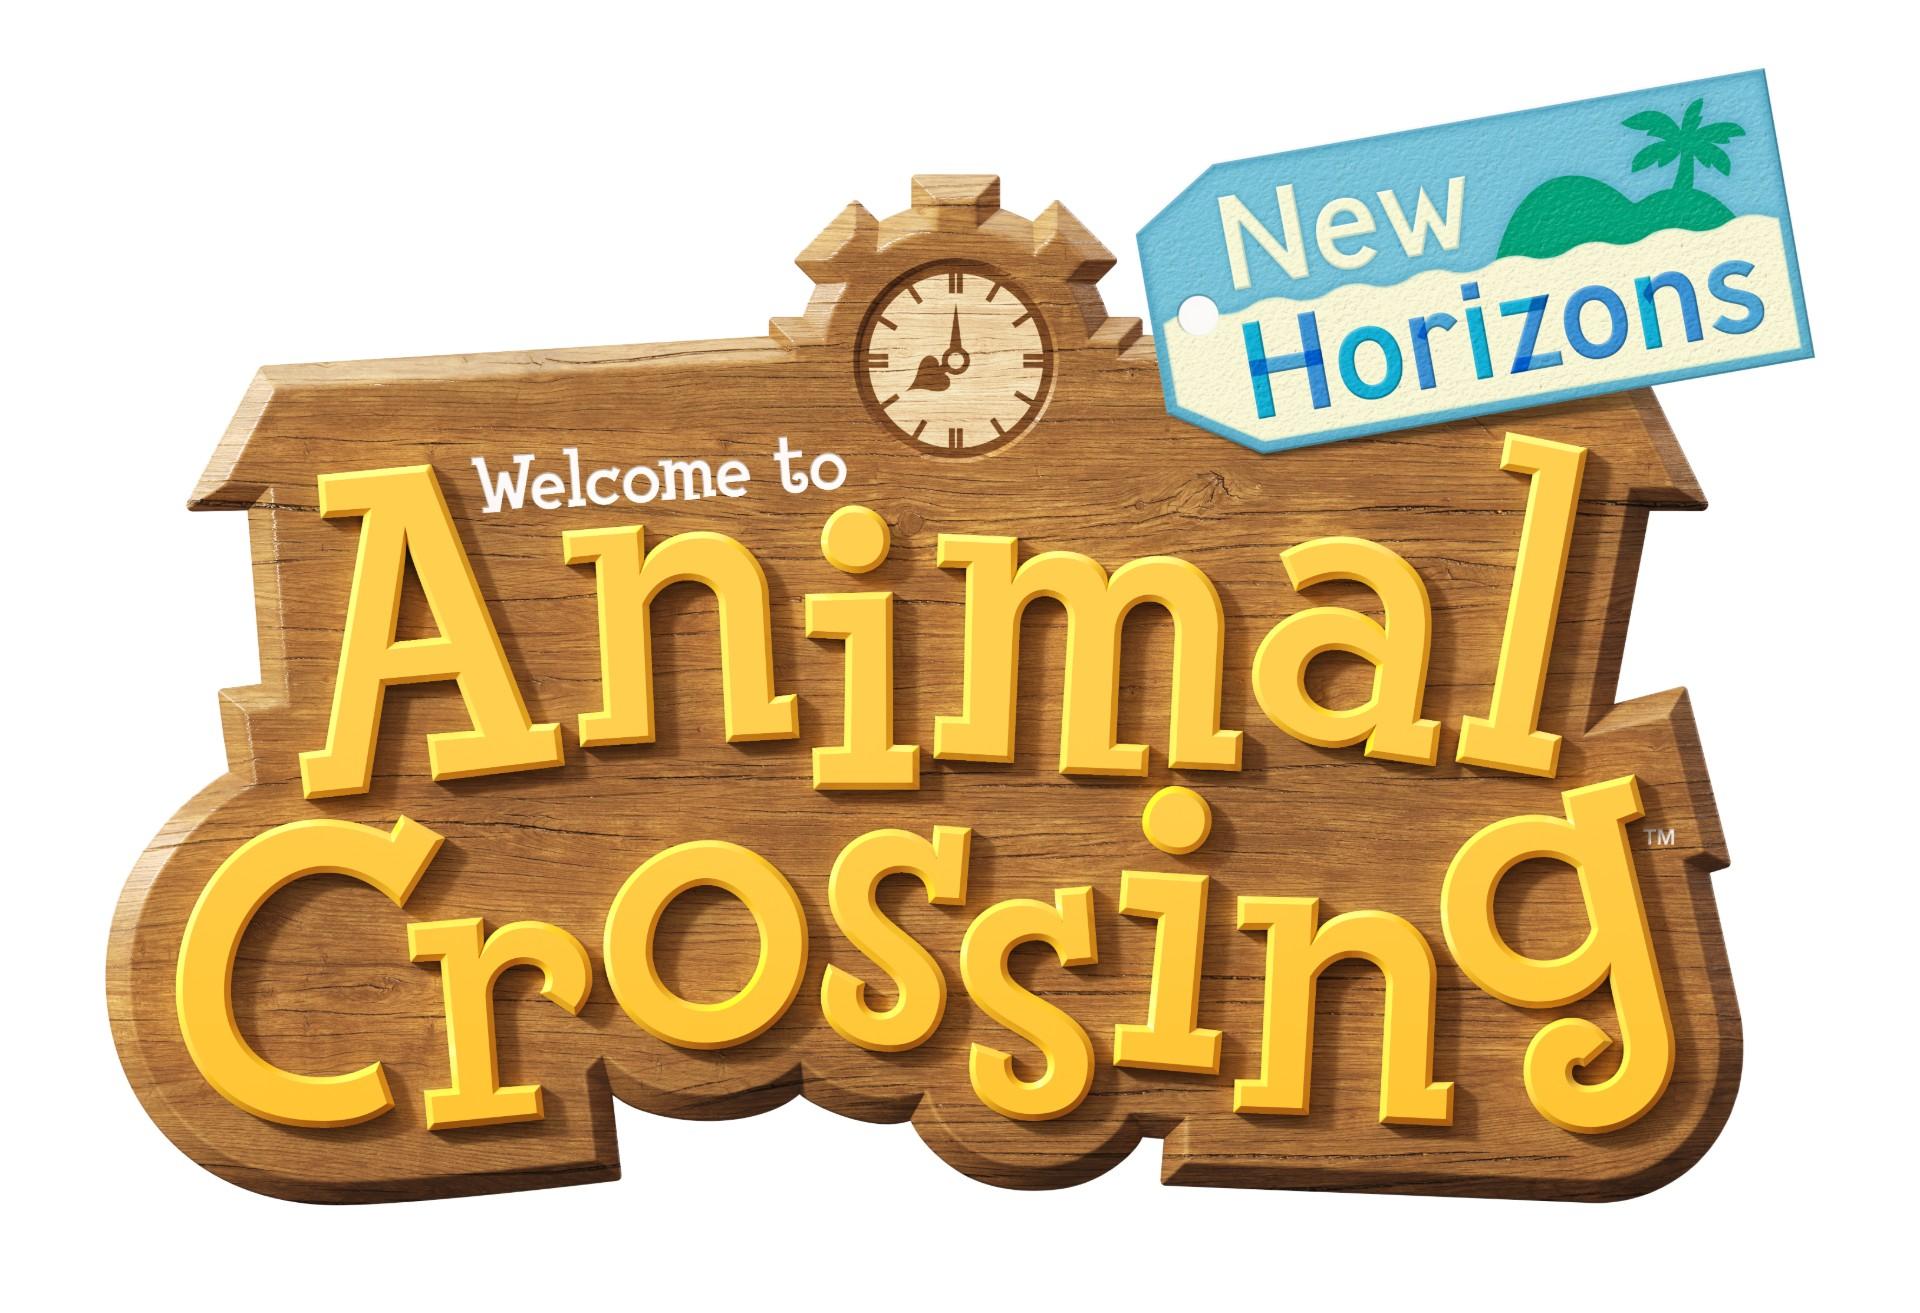 animal crossing: new horizons wallpaper logo